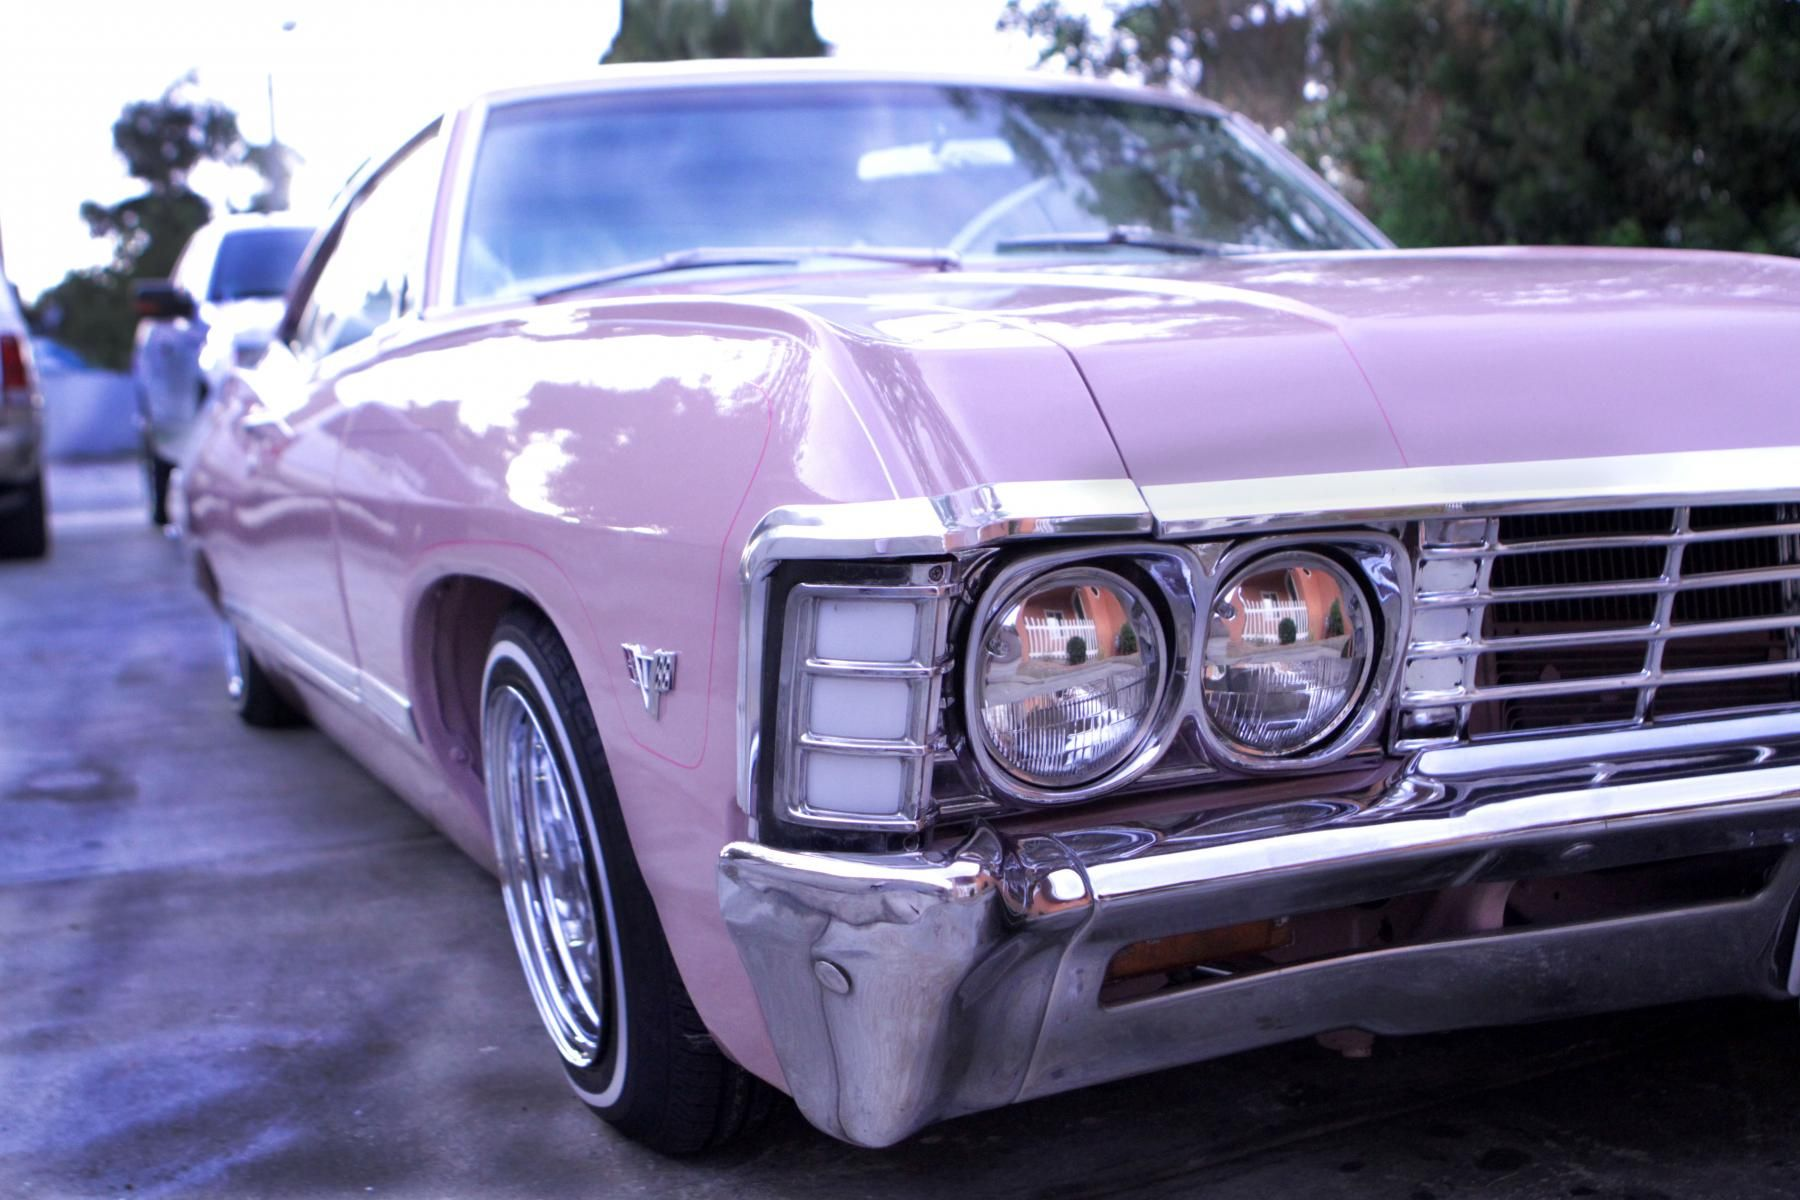 Lavender Impala 67 Impala Chevy Impala